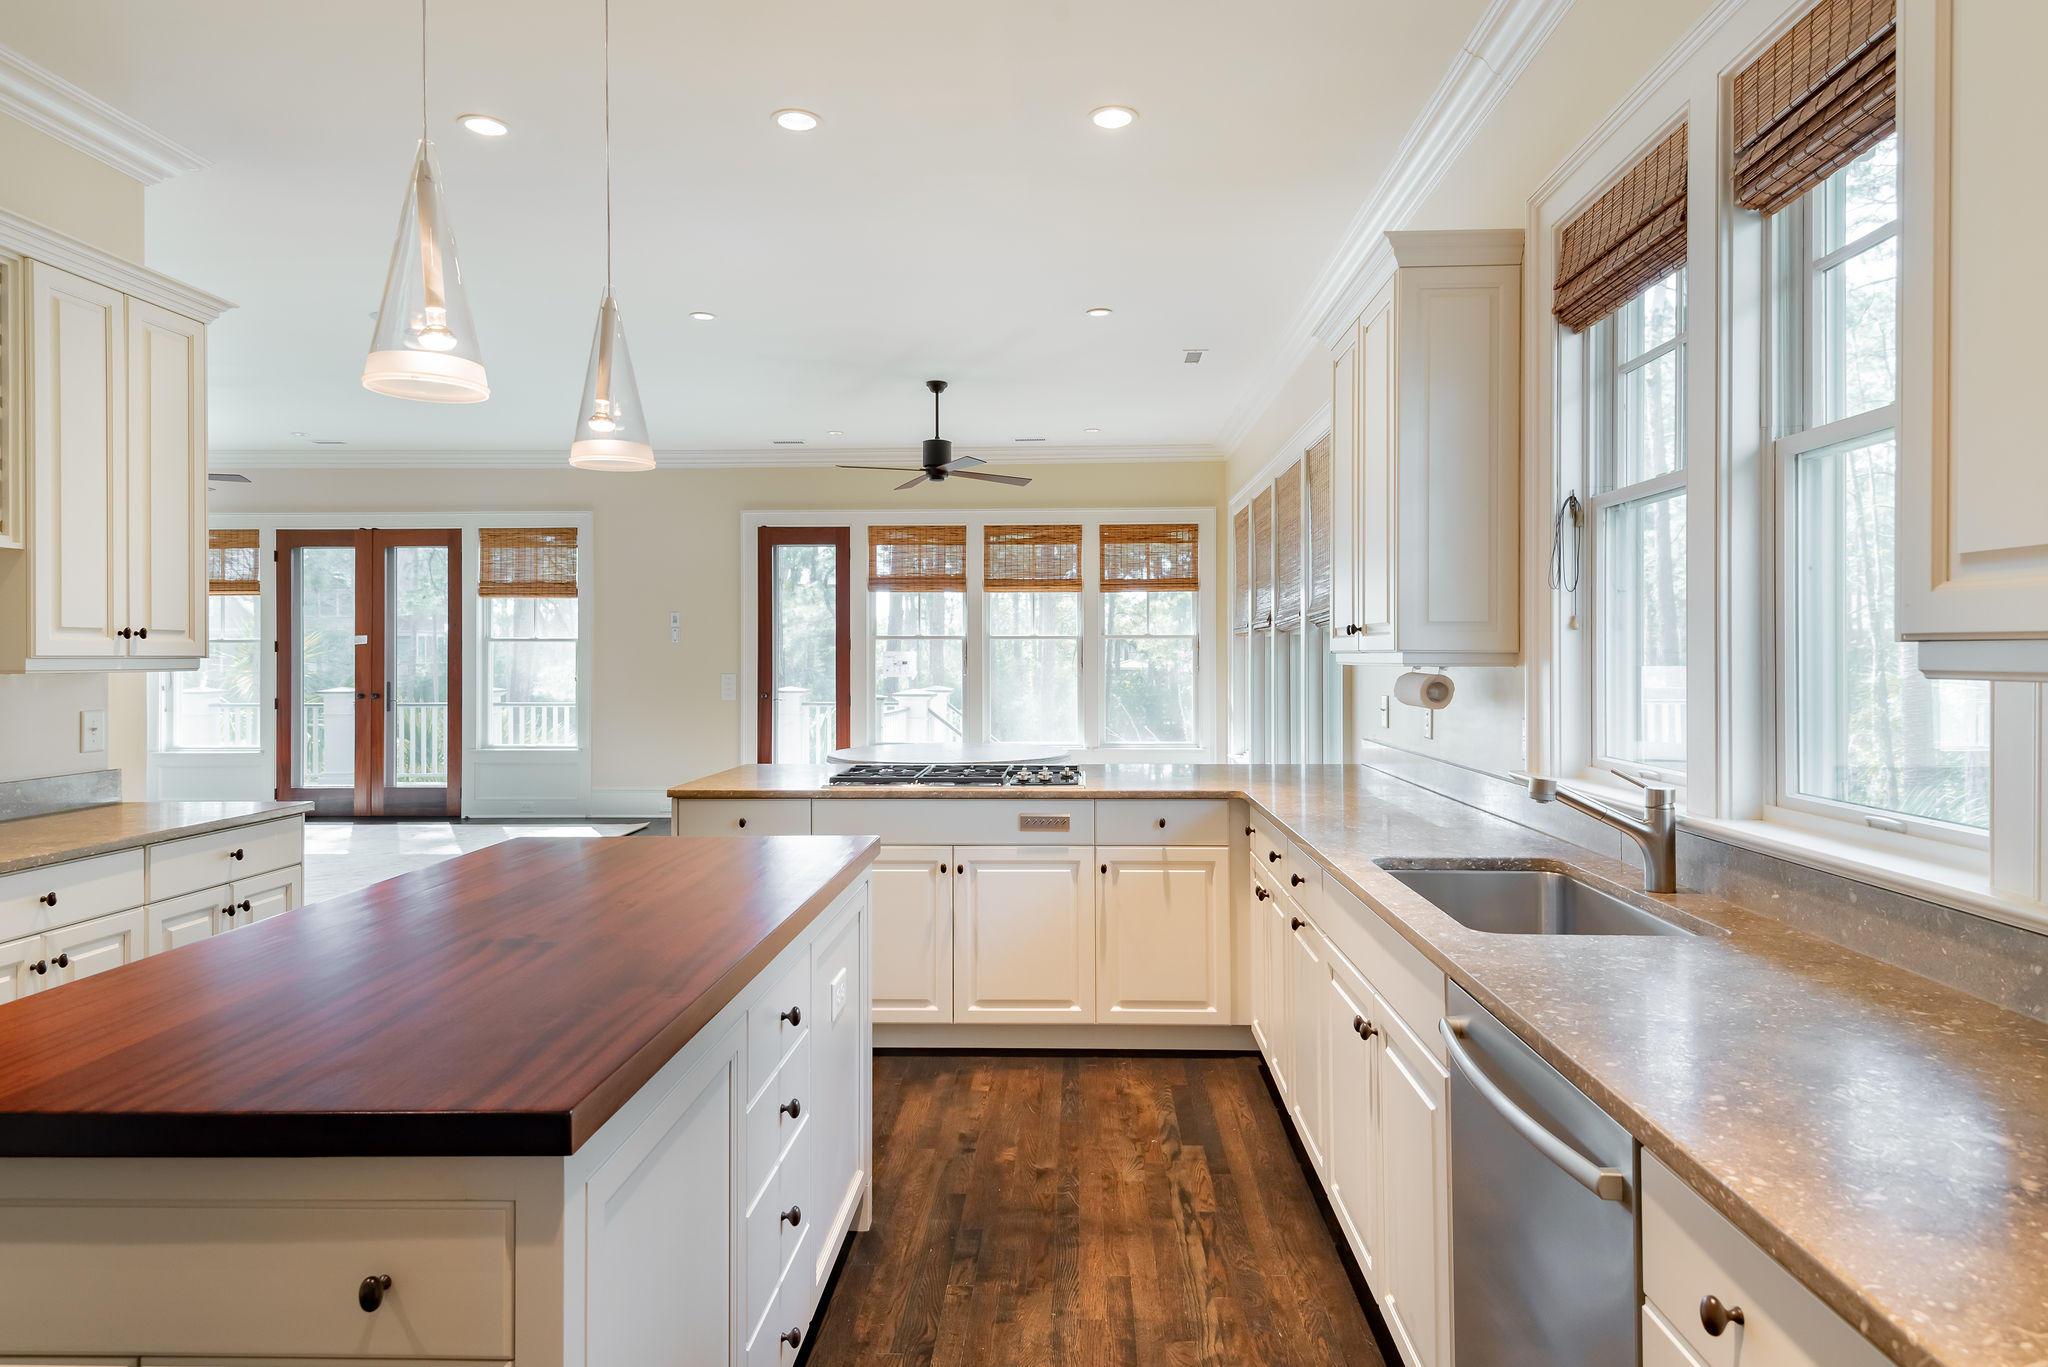 Kiawah Island Homes For Sale - 3 Grey Widgeon, Kiawah Island, SC - 55